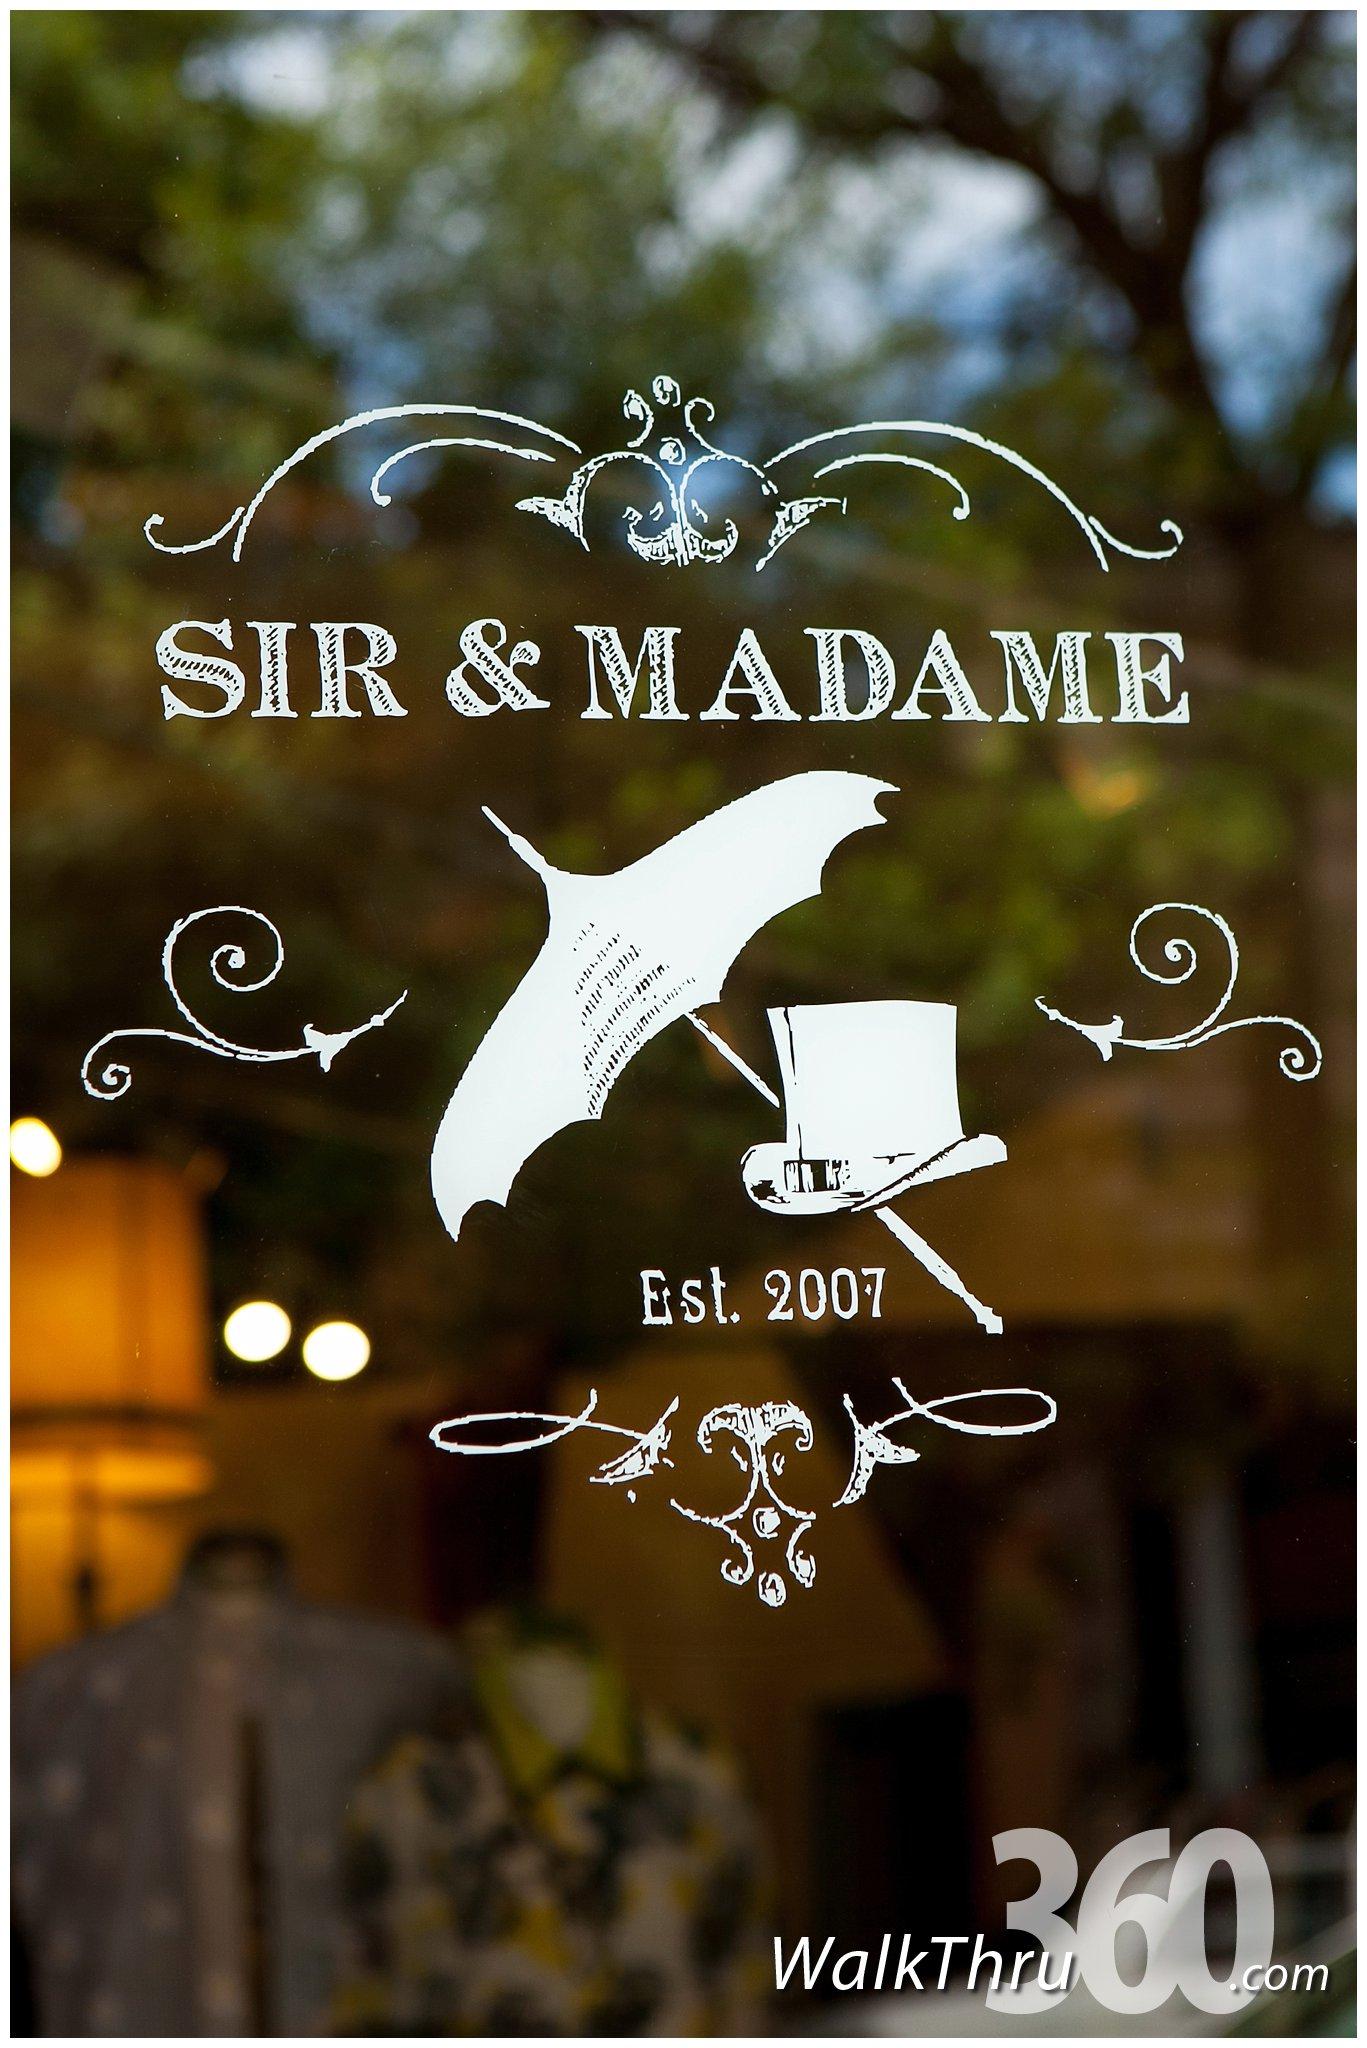 Sir-and-Madame-Chicago-Google-Maps-Virtual-Tour-Example_1254.jpg